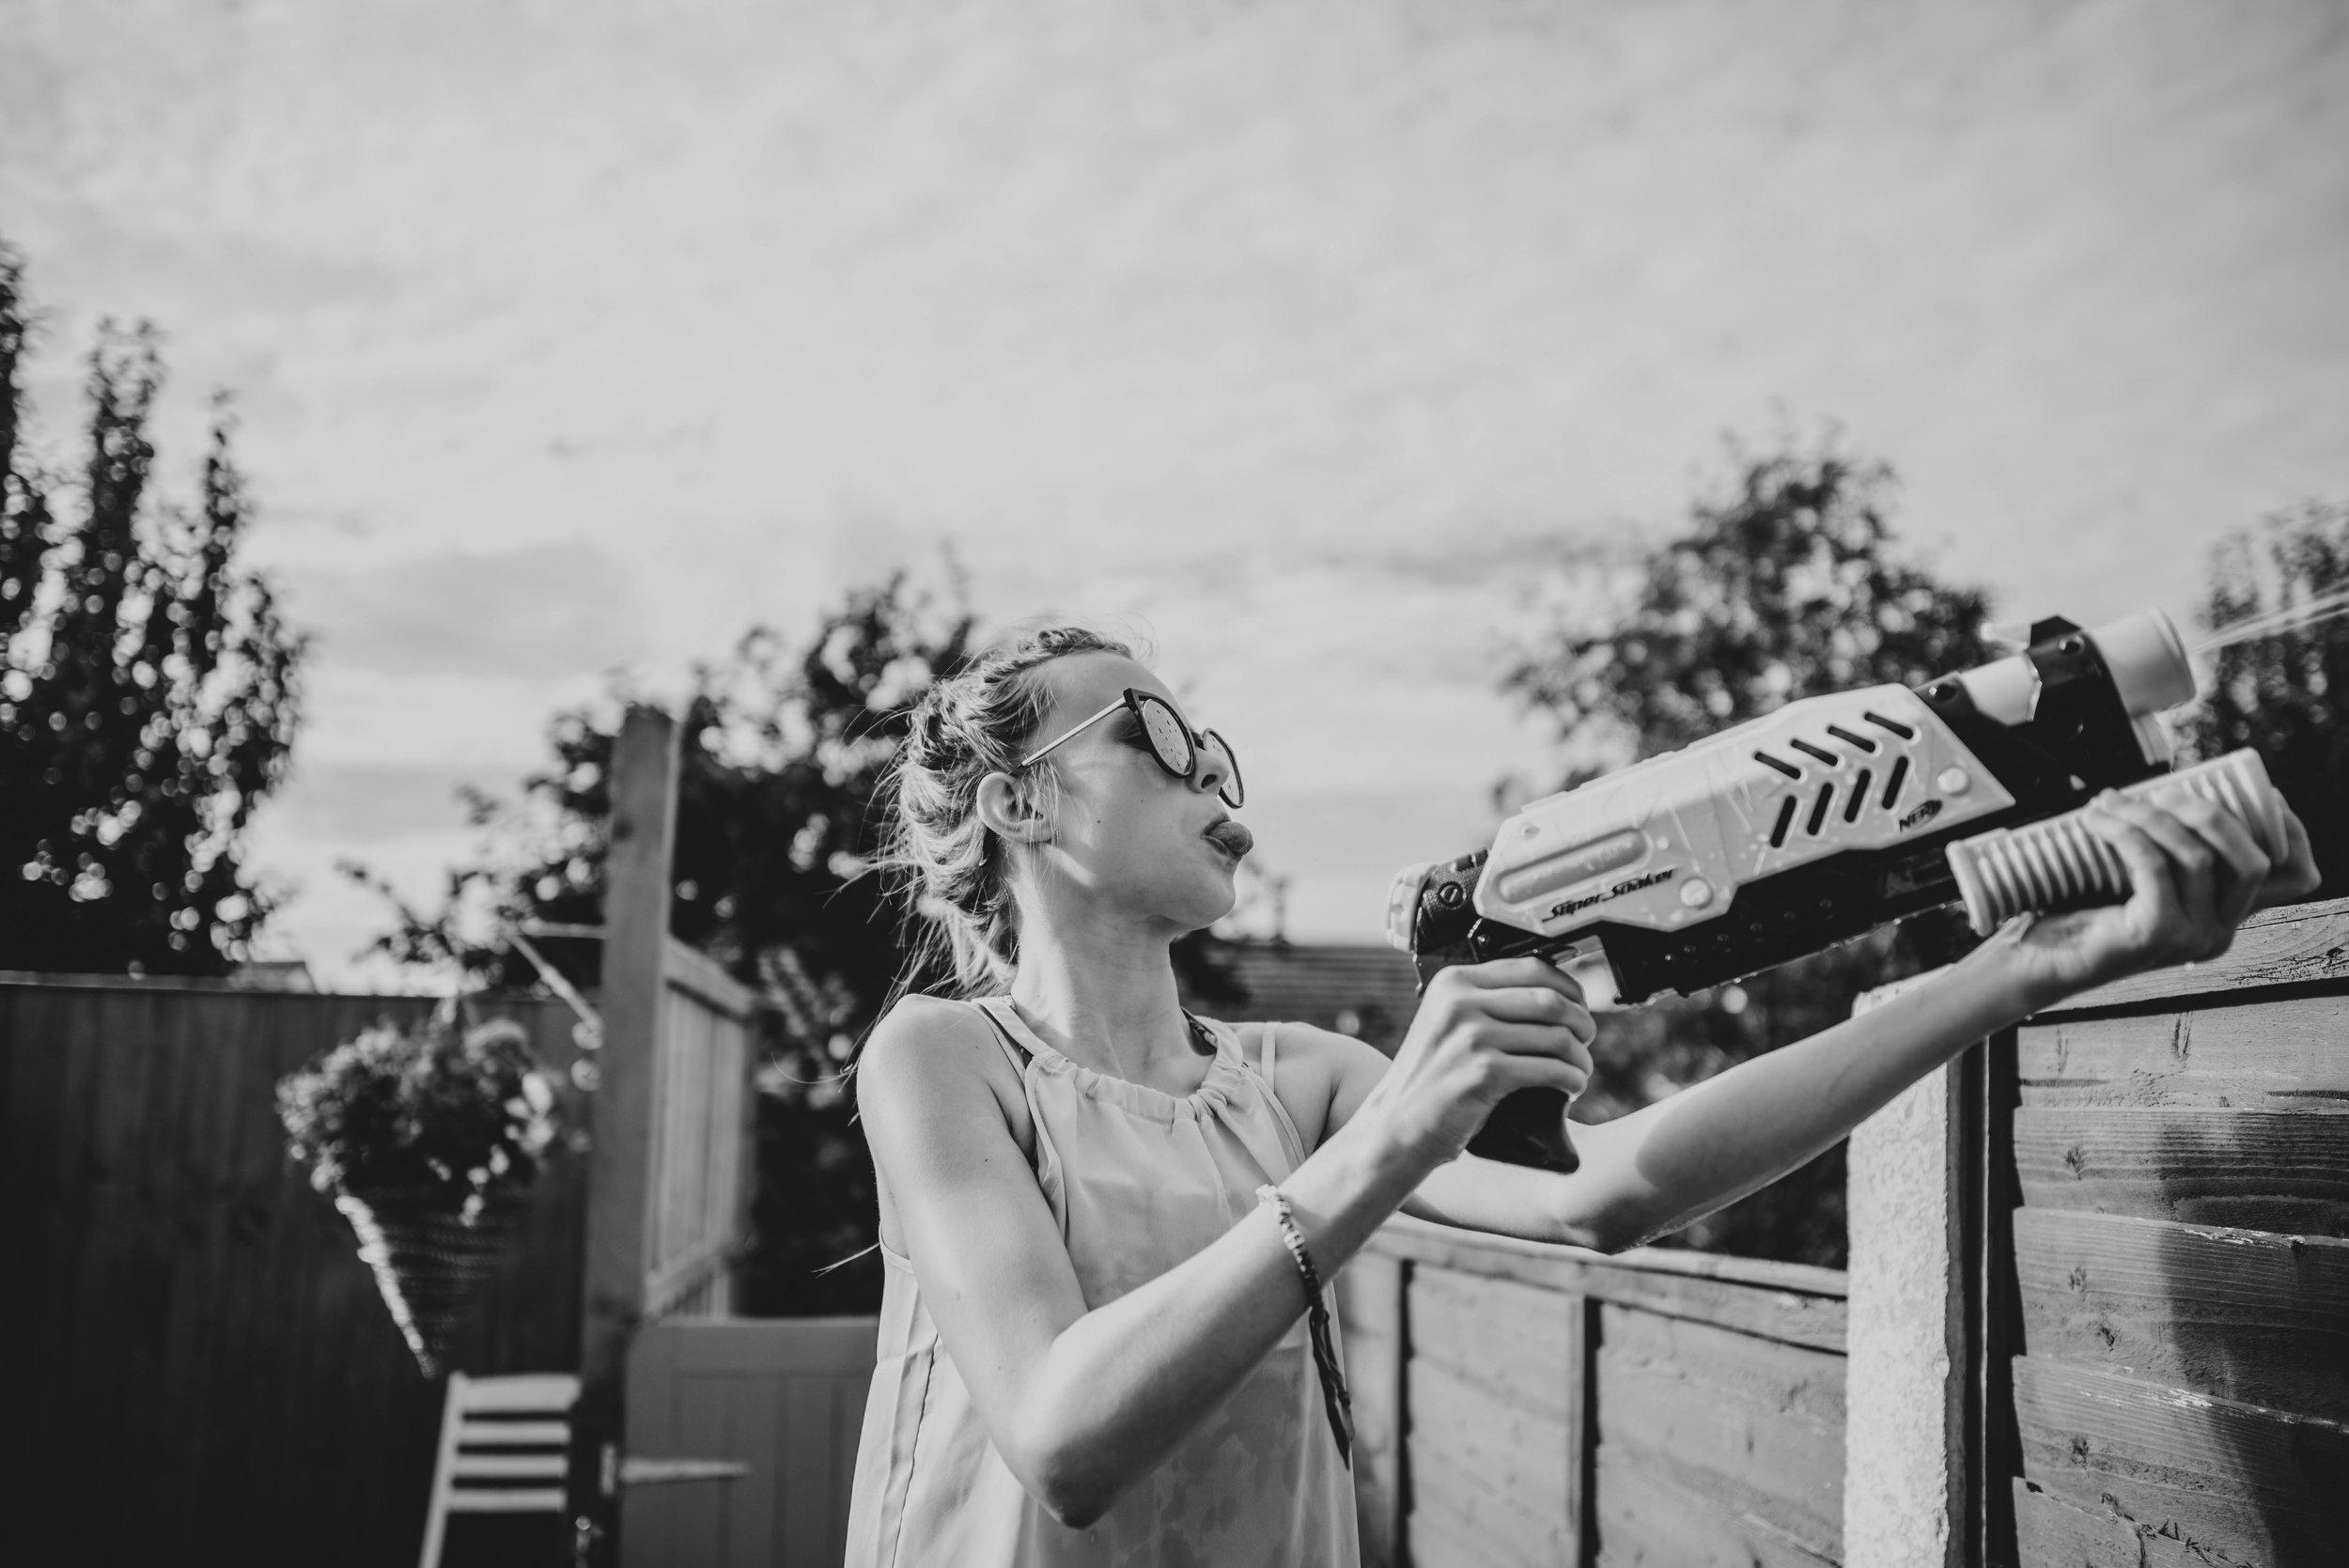 teen girl shoots water pistol over fence Essex UK Documentary Portrait Photographer